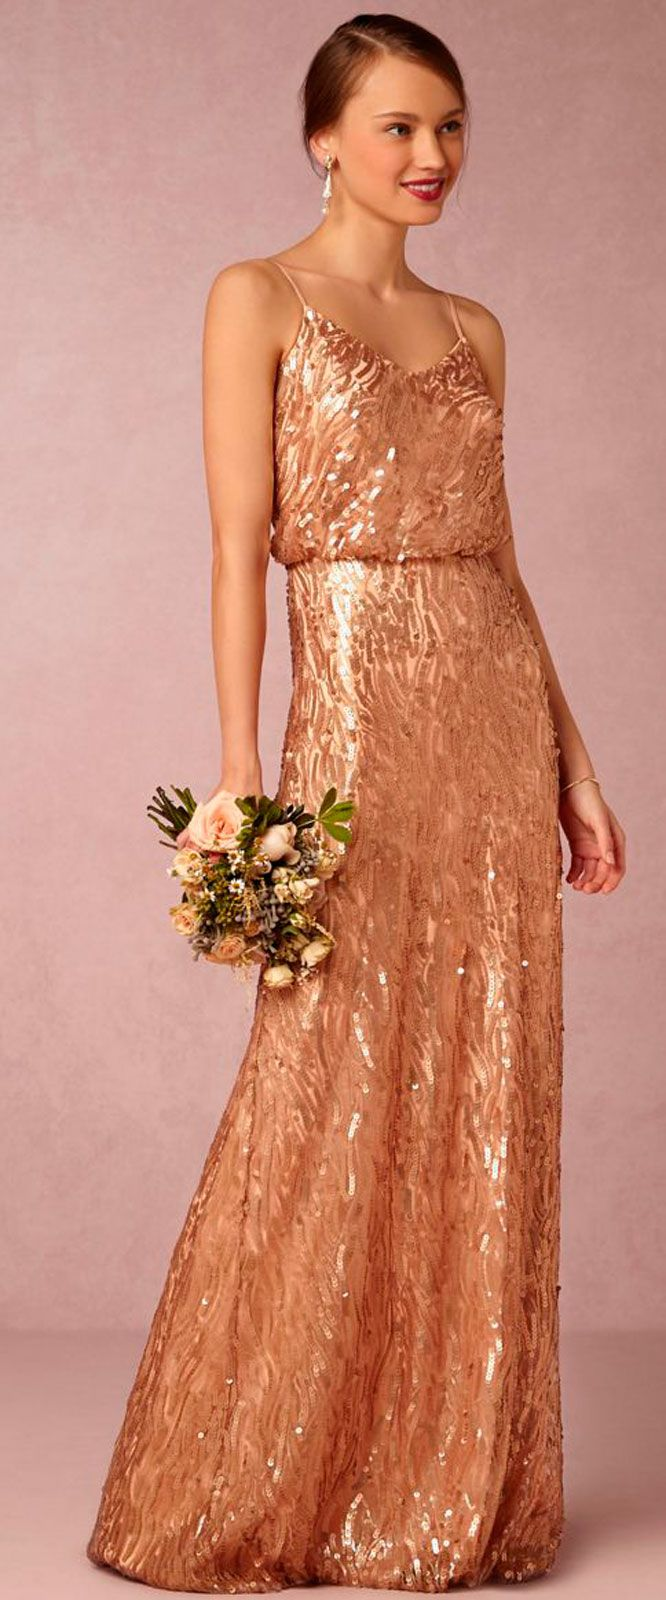 Copper and rose gold wedding vestidos lindos pinterest rose copper and rose gold wedding ombrellifo Images